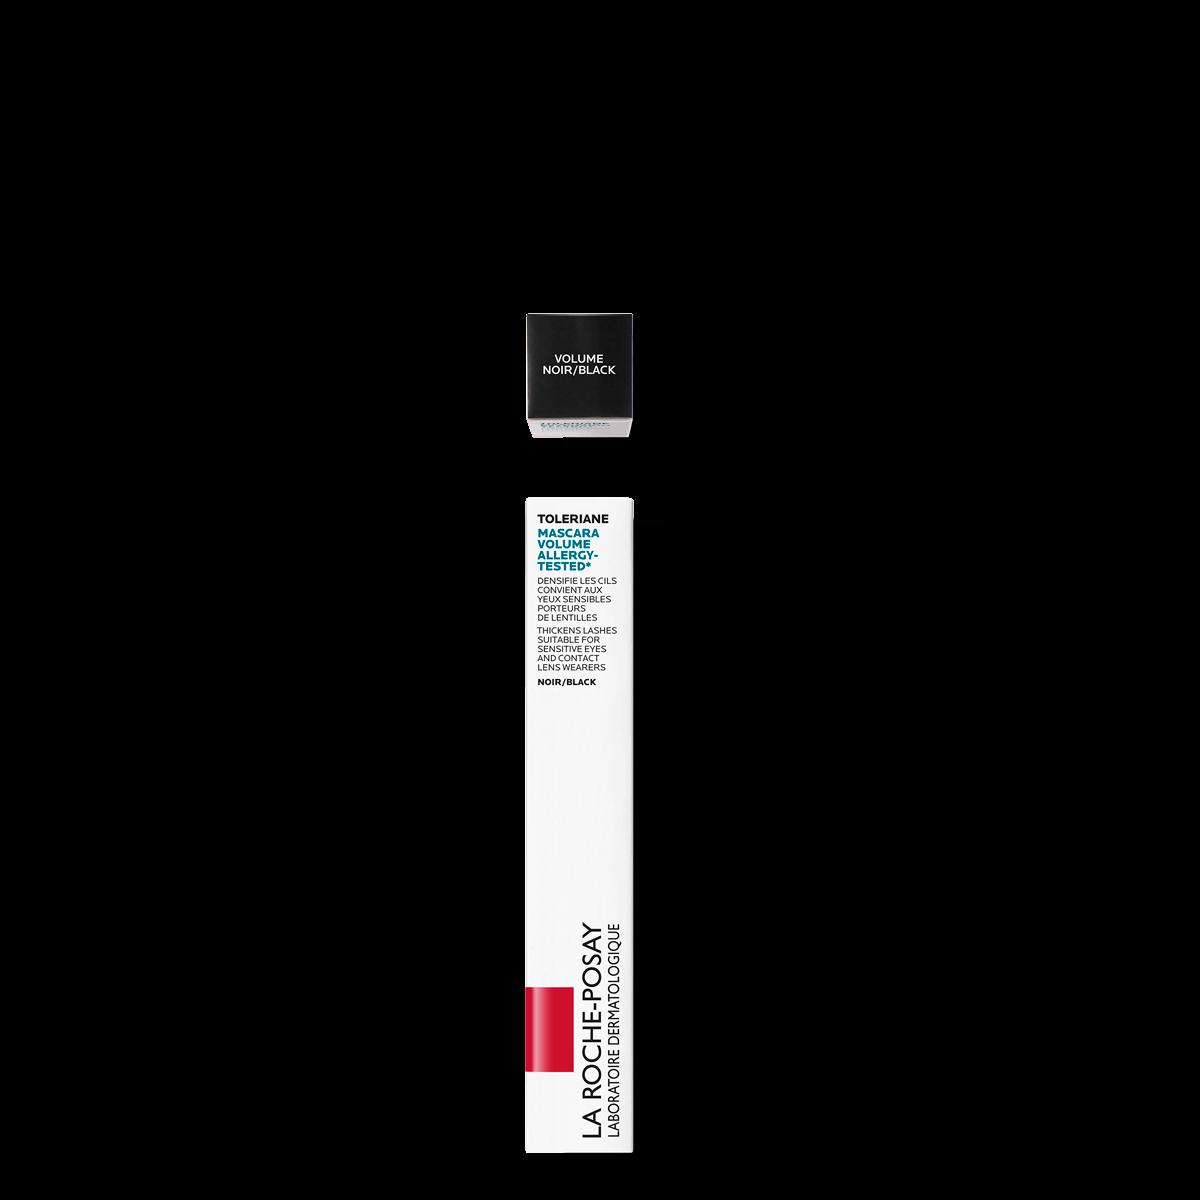 La Roche Posay Känslig Toleriane Make up VOLUME MASCARA Black 333787